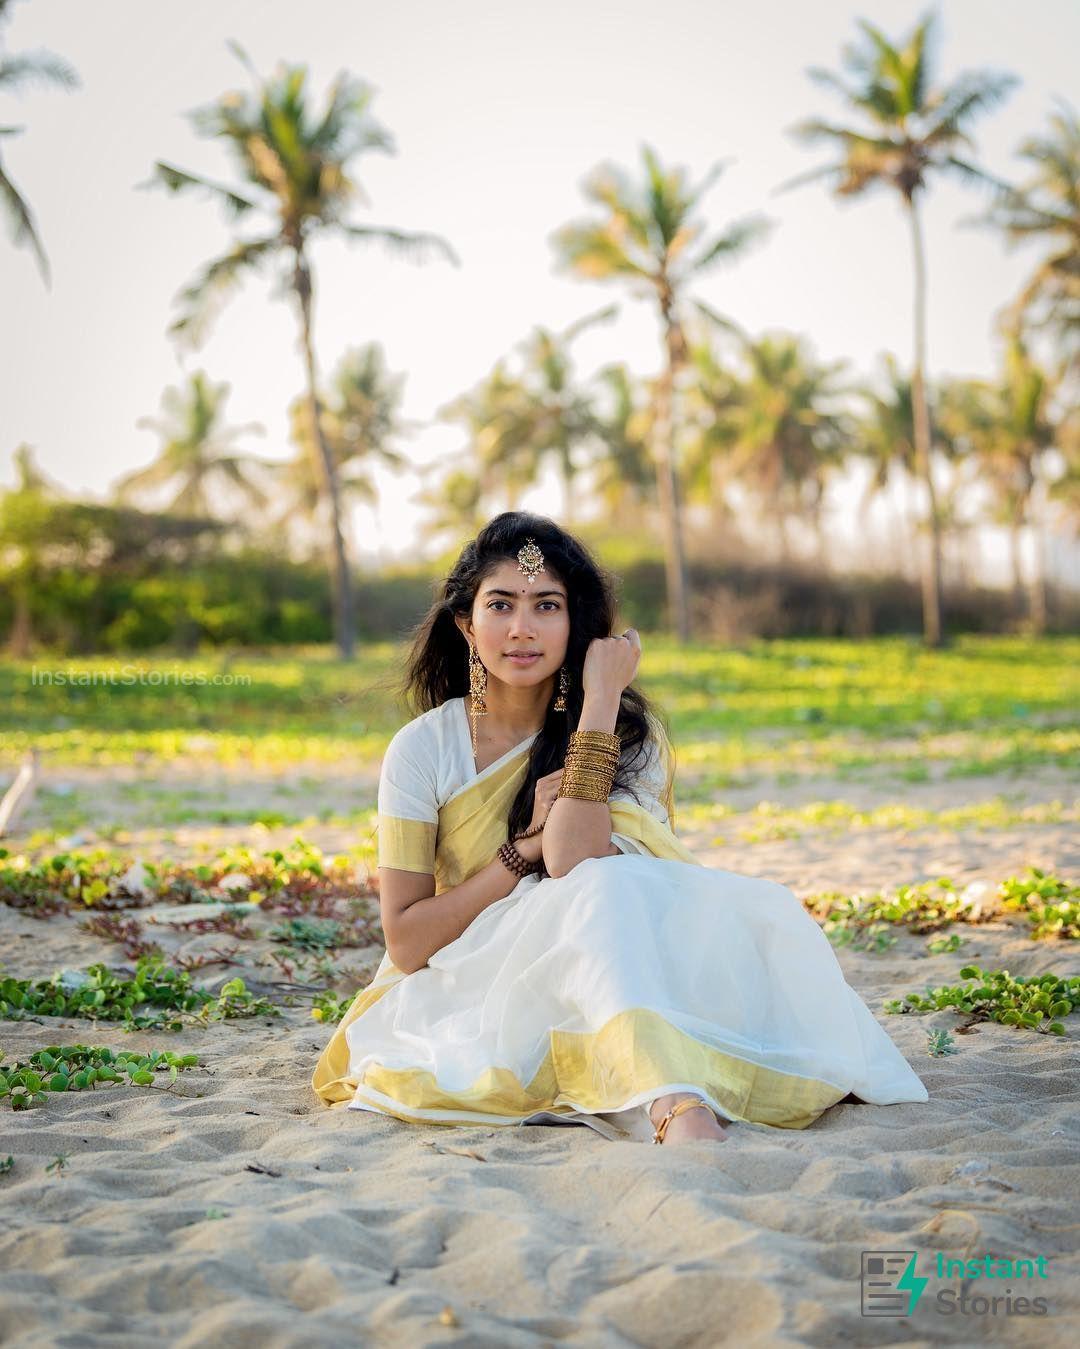 Sai Pallavi Latest Hot Images (10751) - Sai Pallavi